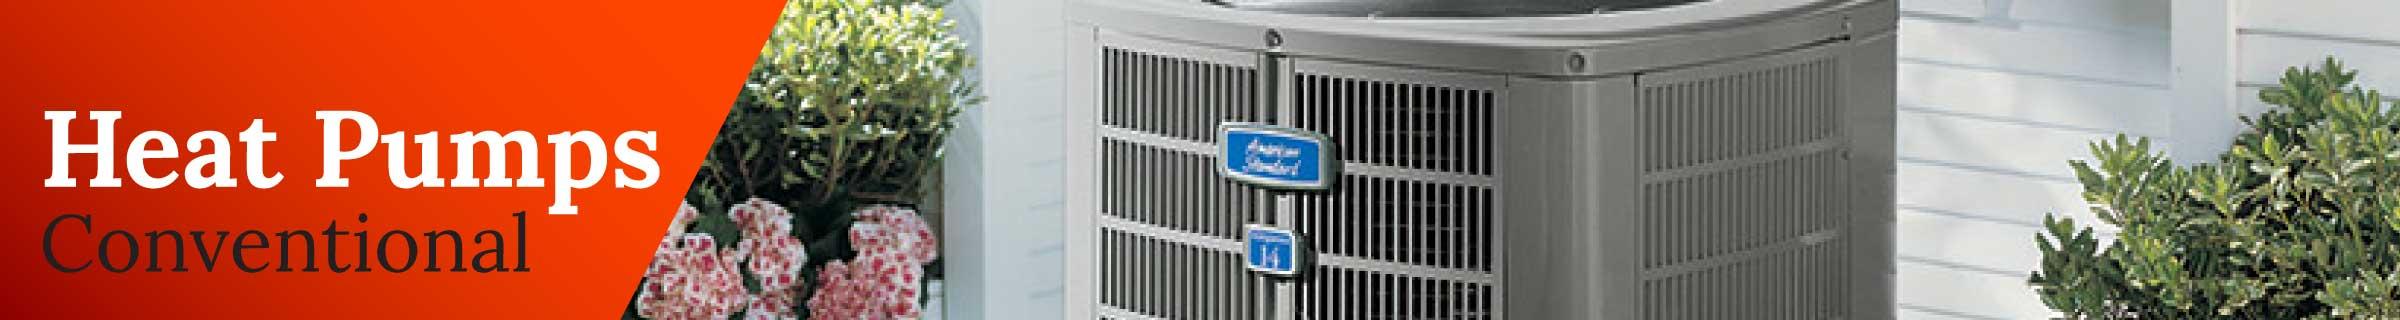 Ardmore Heat Pump Repair, Maintenance & Install | American